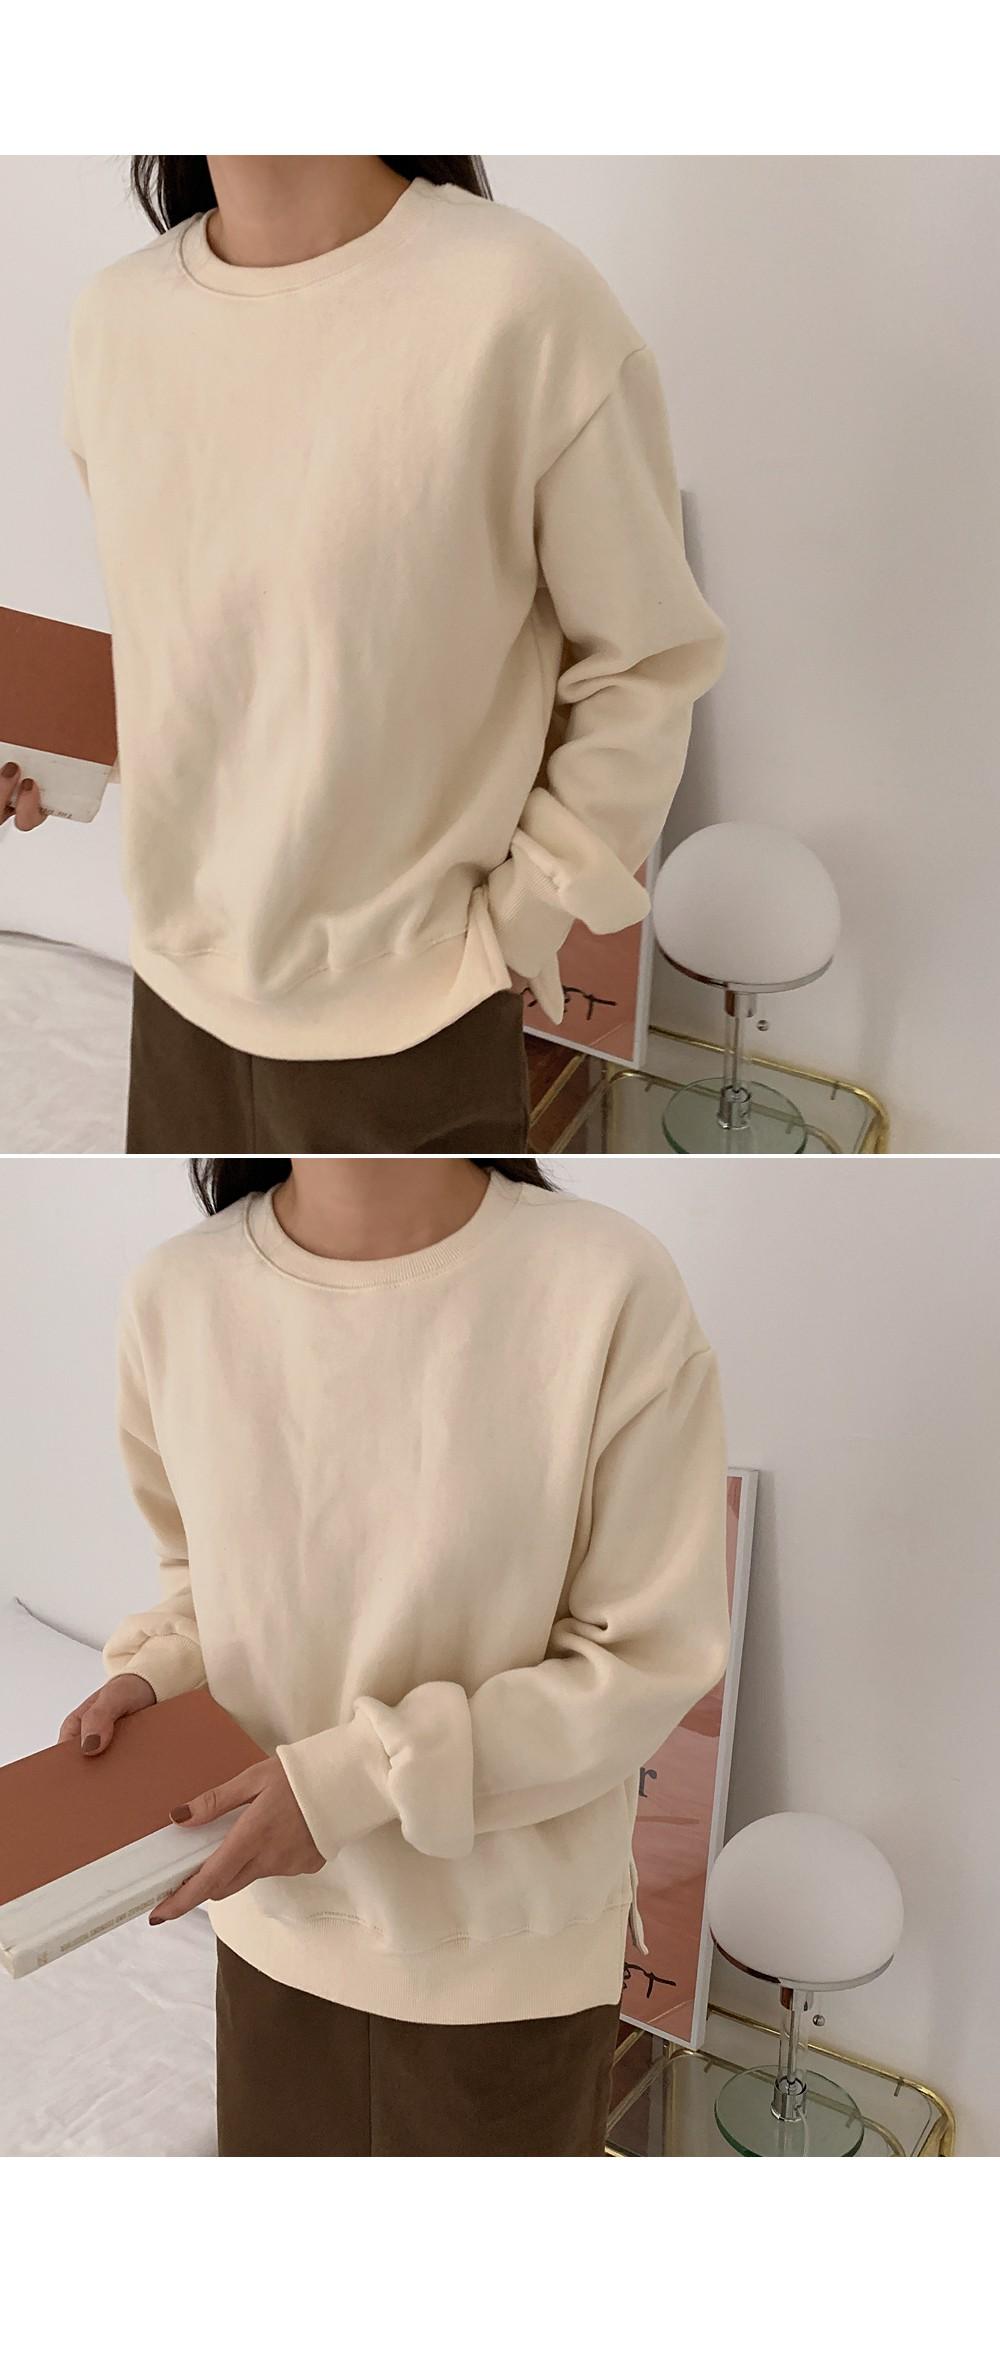 Captain Fleece-lined split SK ♥ comfortable elasticity :)